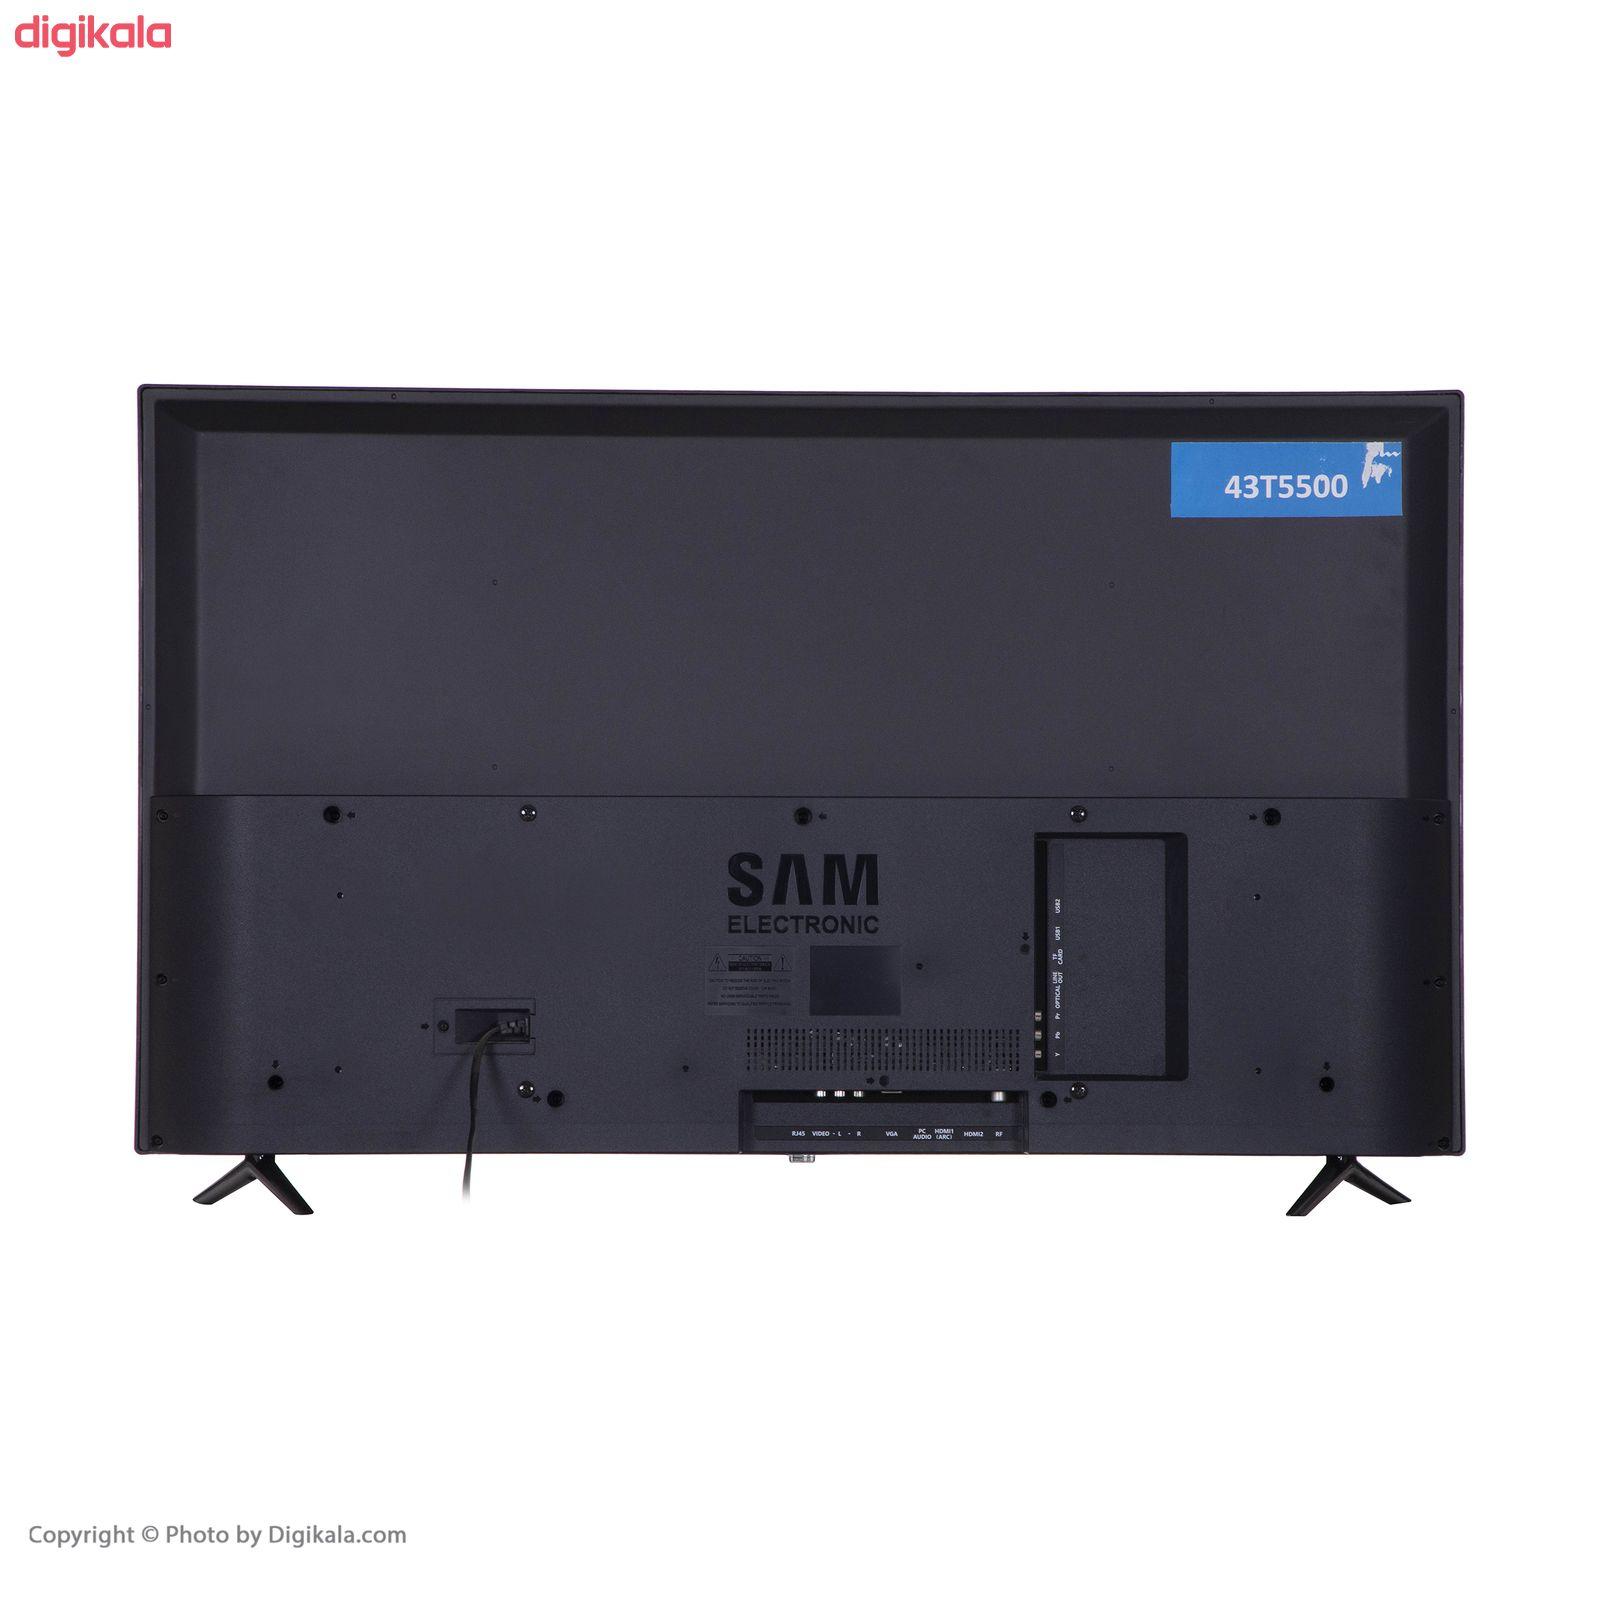 تلویزیون ال ای دی هوشمند سام الکترونیک مدل UA43T5500TH سایز ۴۳ اینچ main 1 3